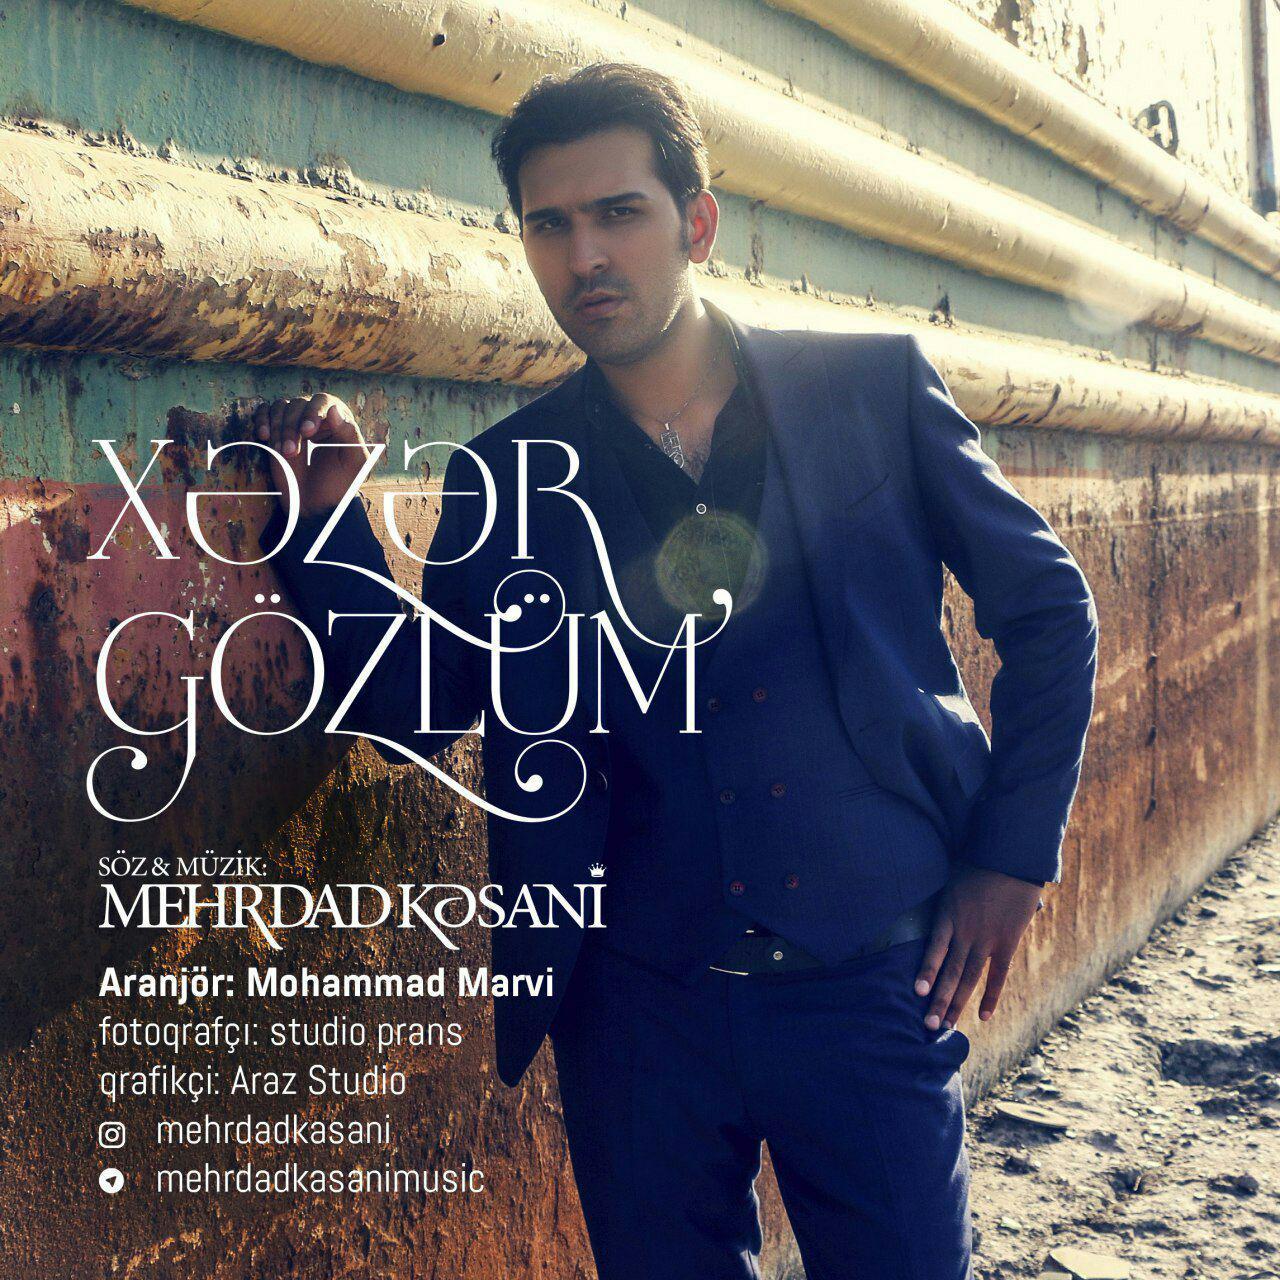 http://s9.picofile.com/file/8303726834/04Mehrdad_Kesani_Xezer_Gozlum.jpg